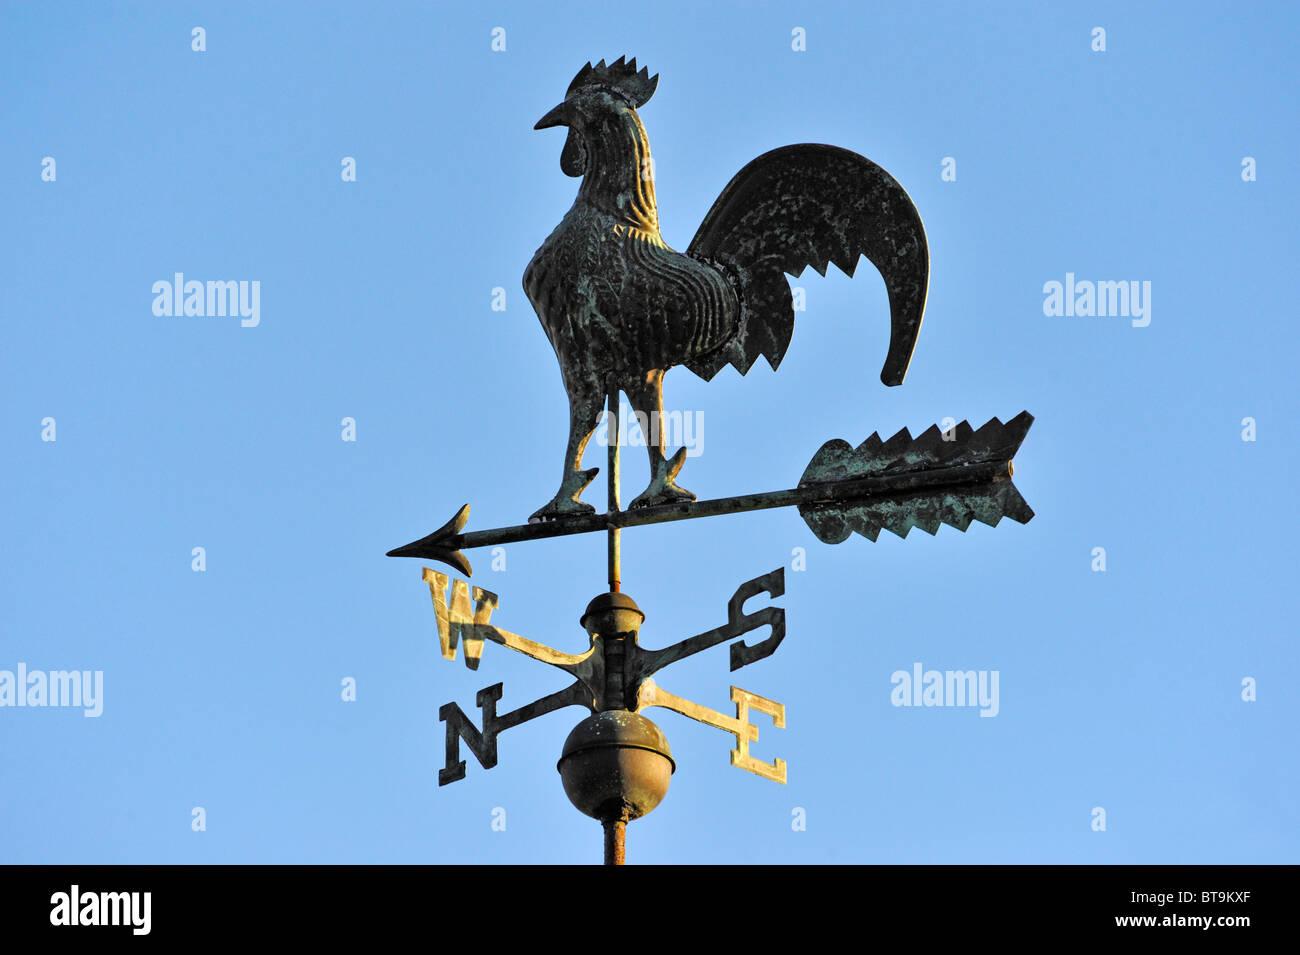 cockerel-weathervane-garth-heads-kendal-cumbria-england-united-kingdom-BT9KXF.jpg